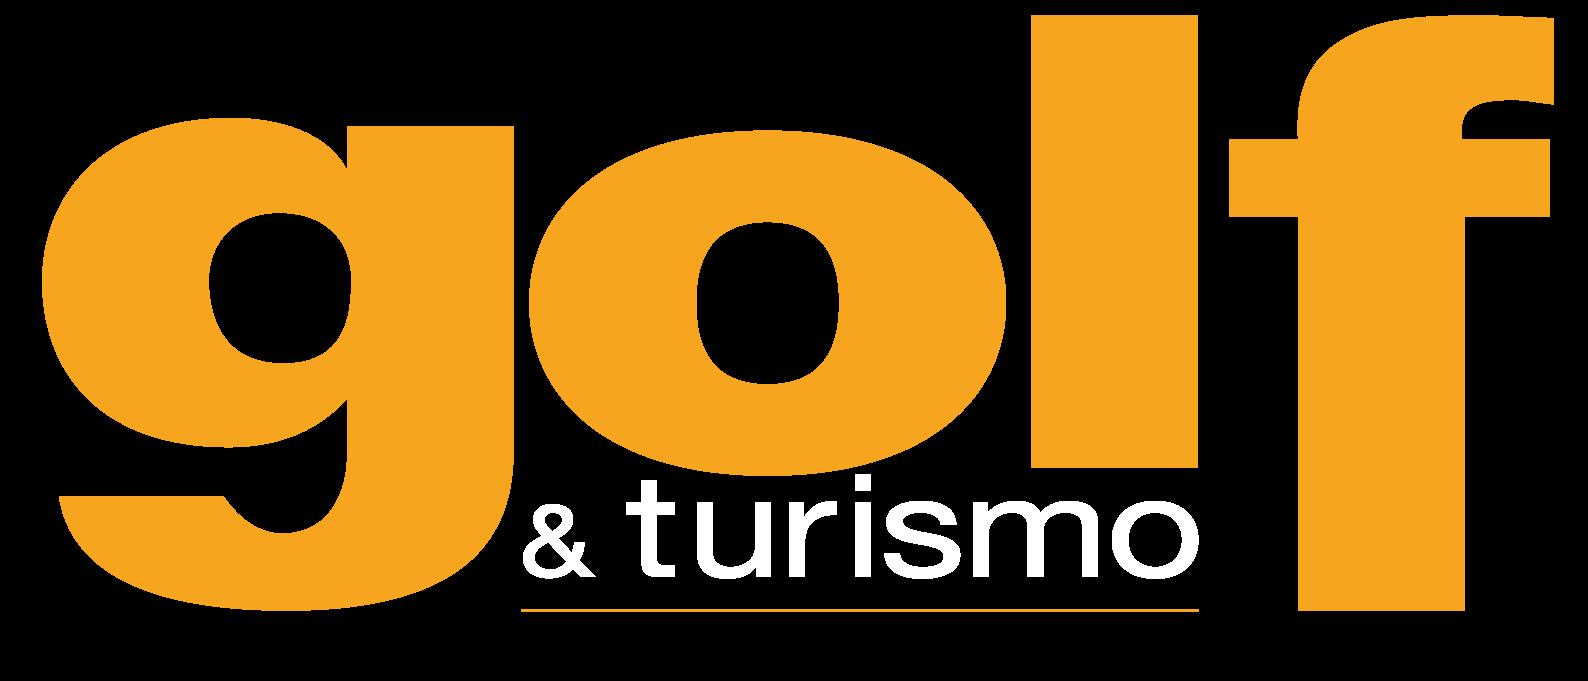 Golfe & Turismo